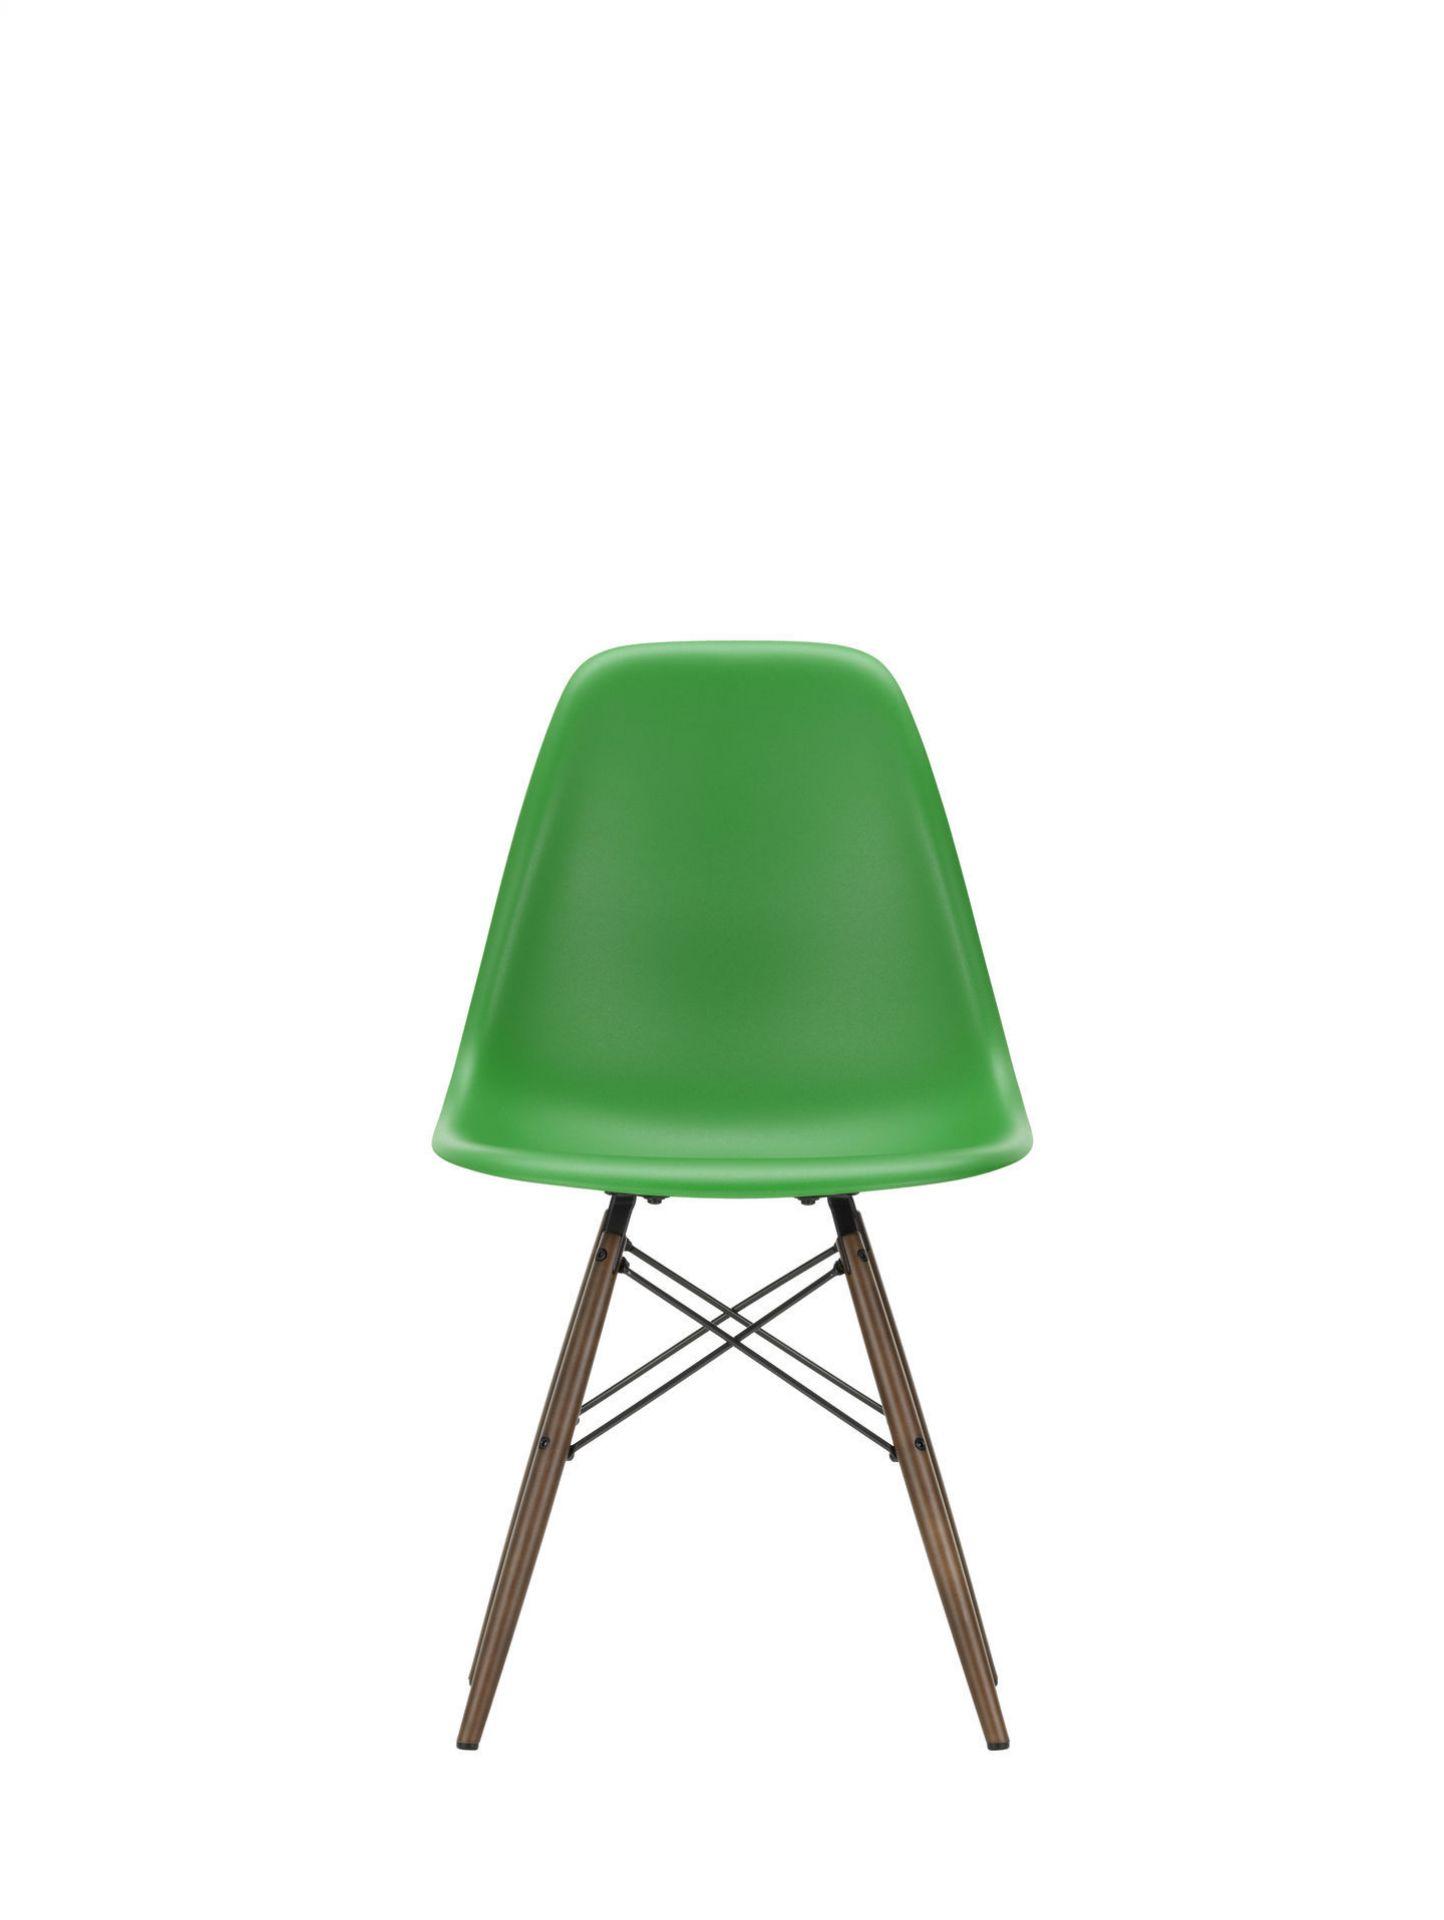 Eames Plastic Side Chair DSW Chair Vitra Maple yellowish-Deep black